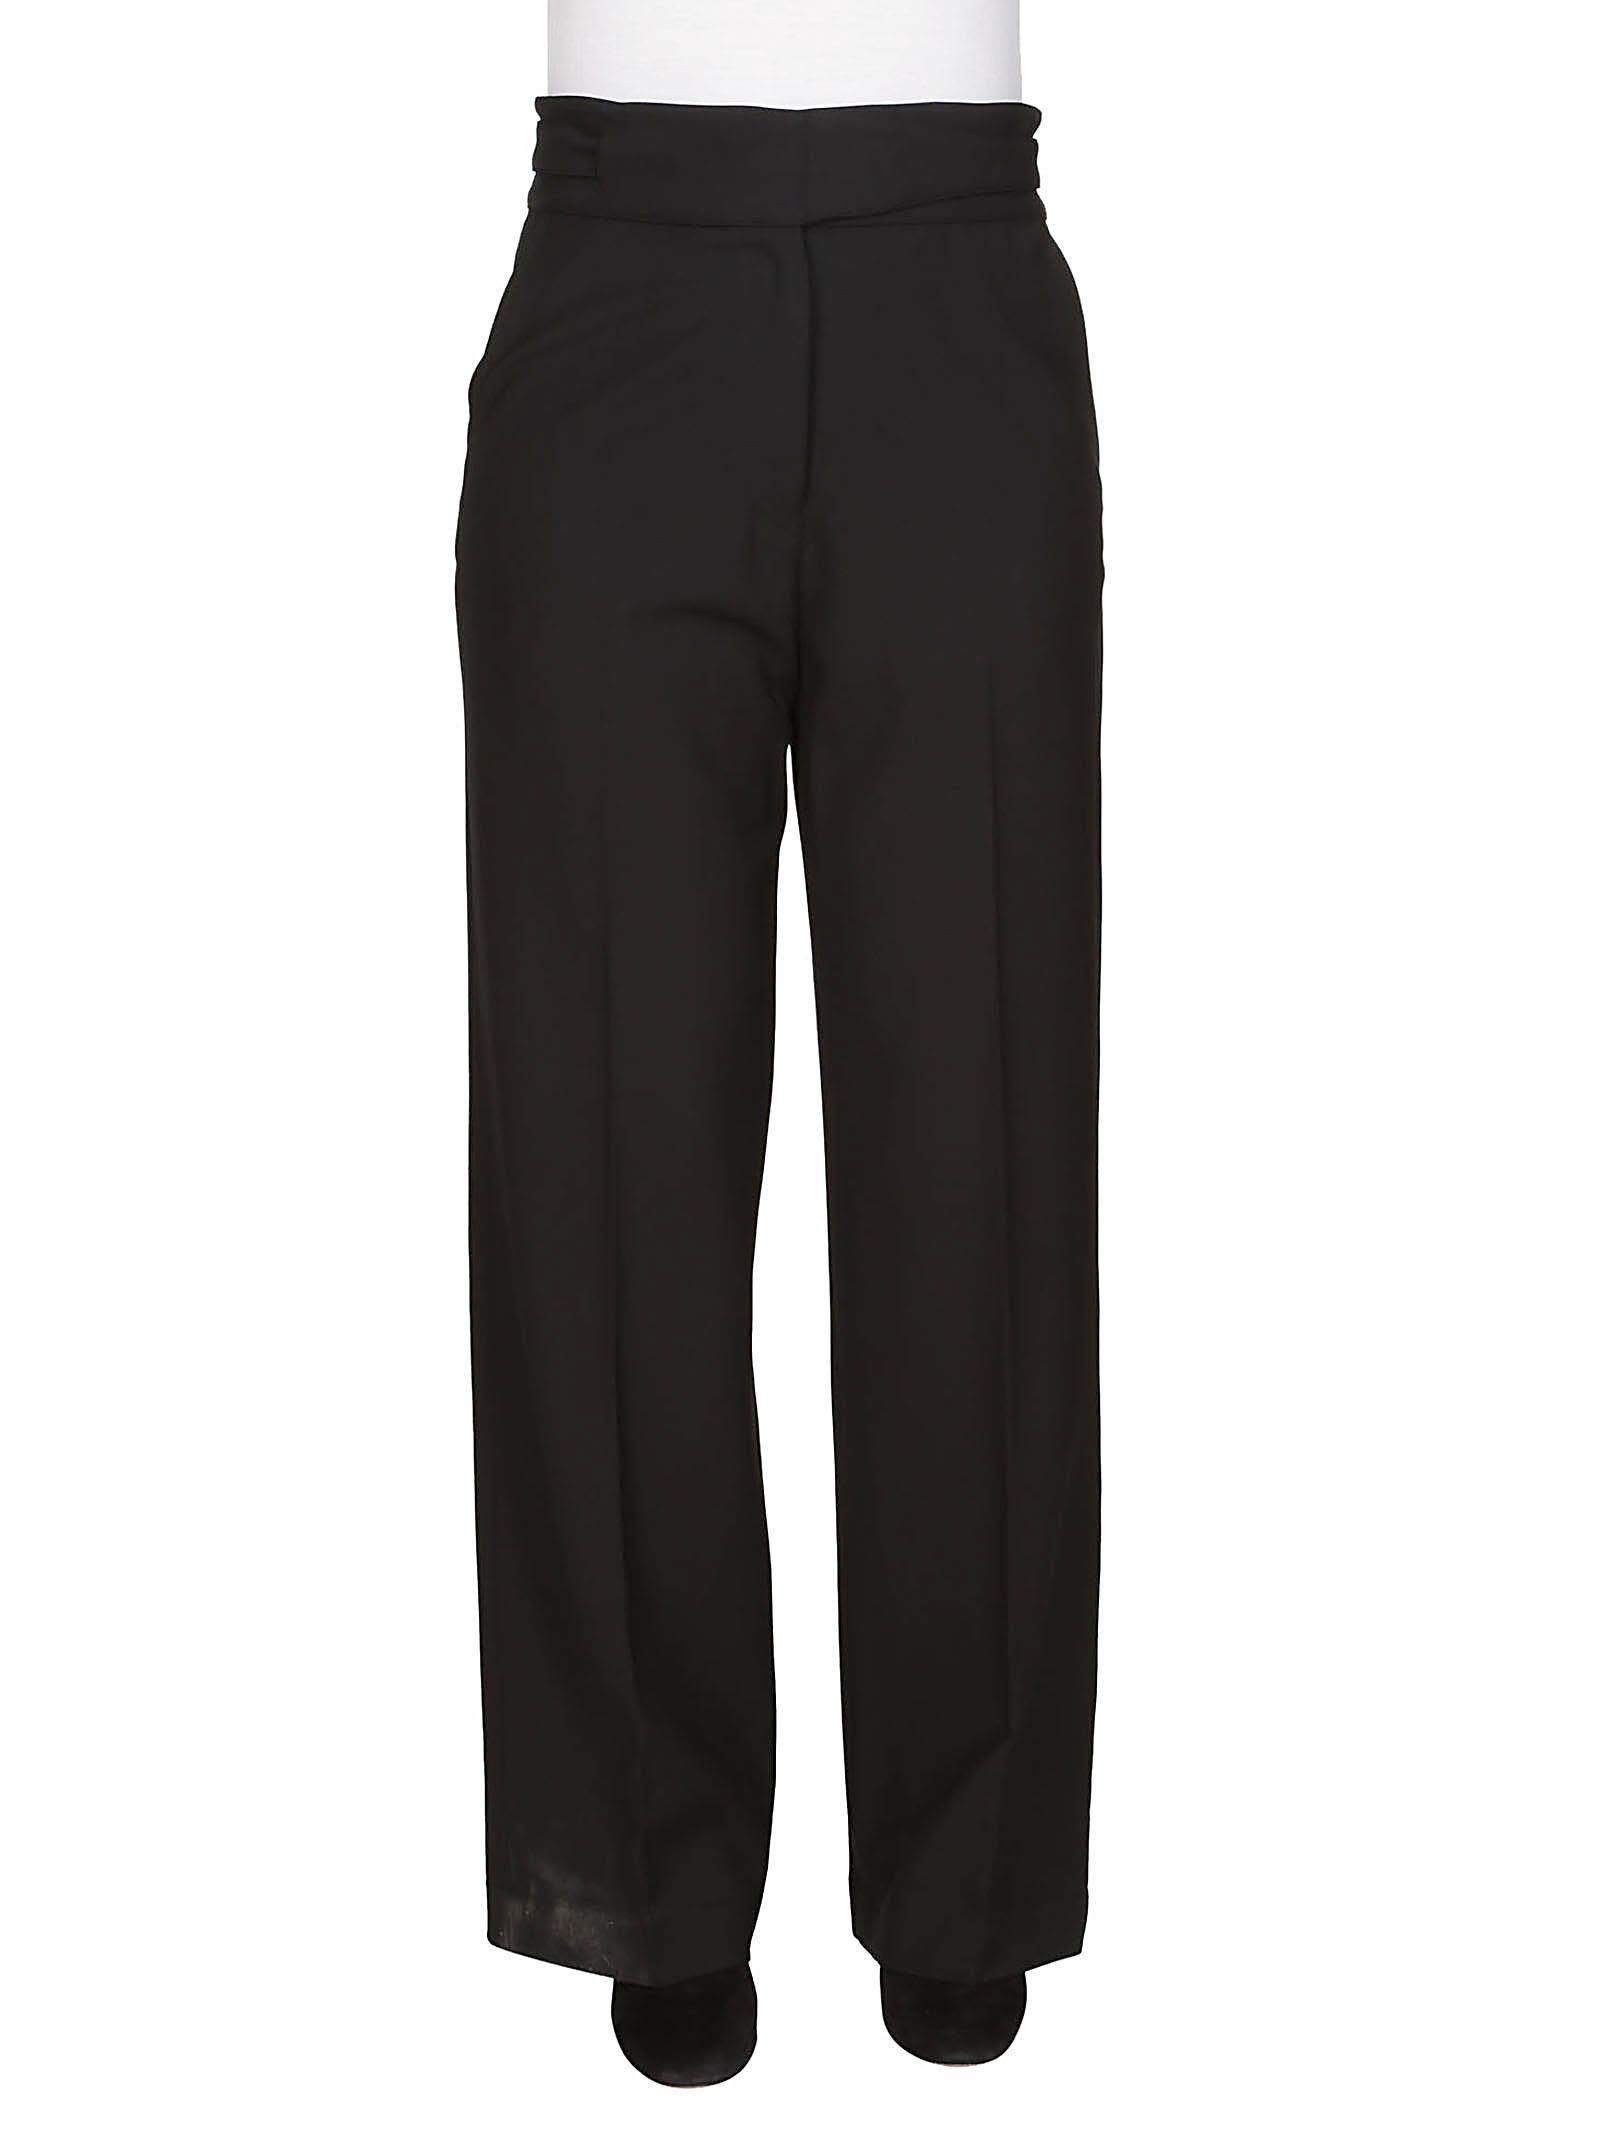 pierna negro Flaneur ancha de Maison pantalones SHtWwqnqX